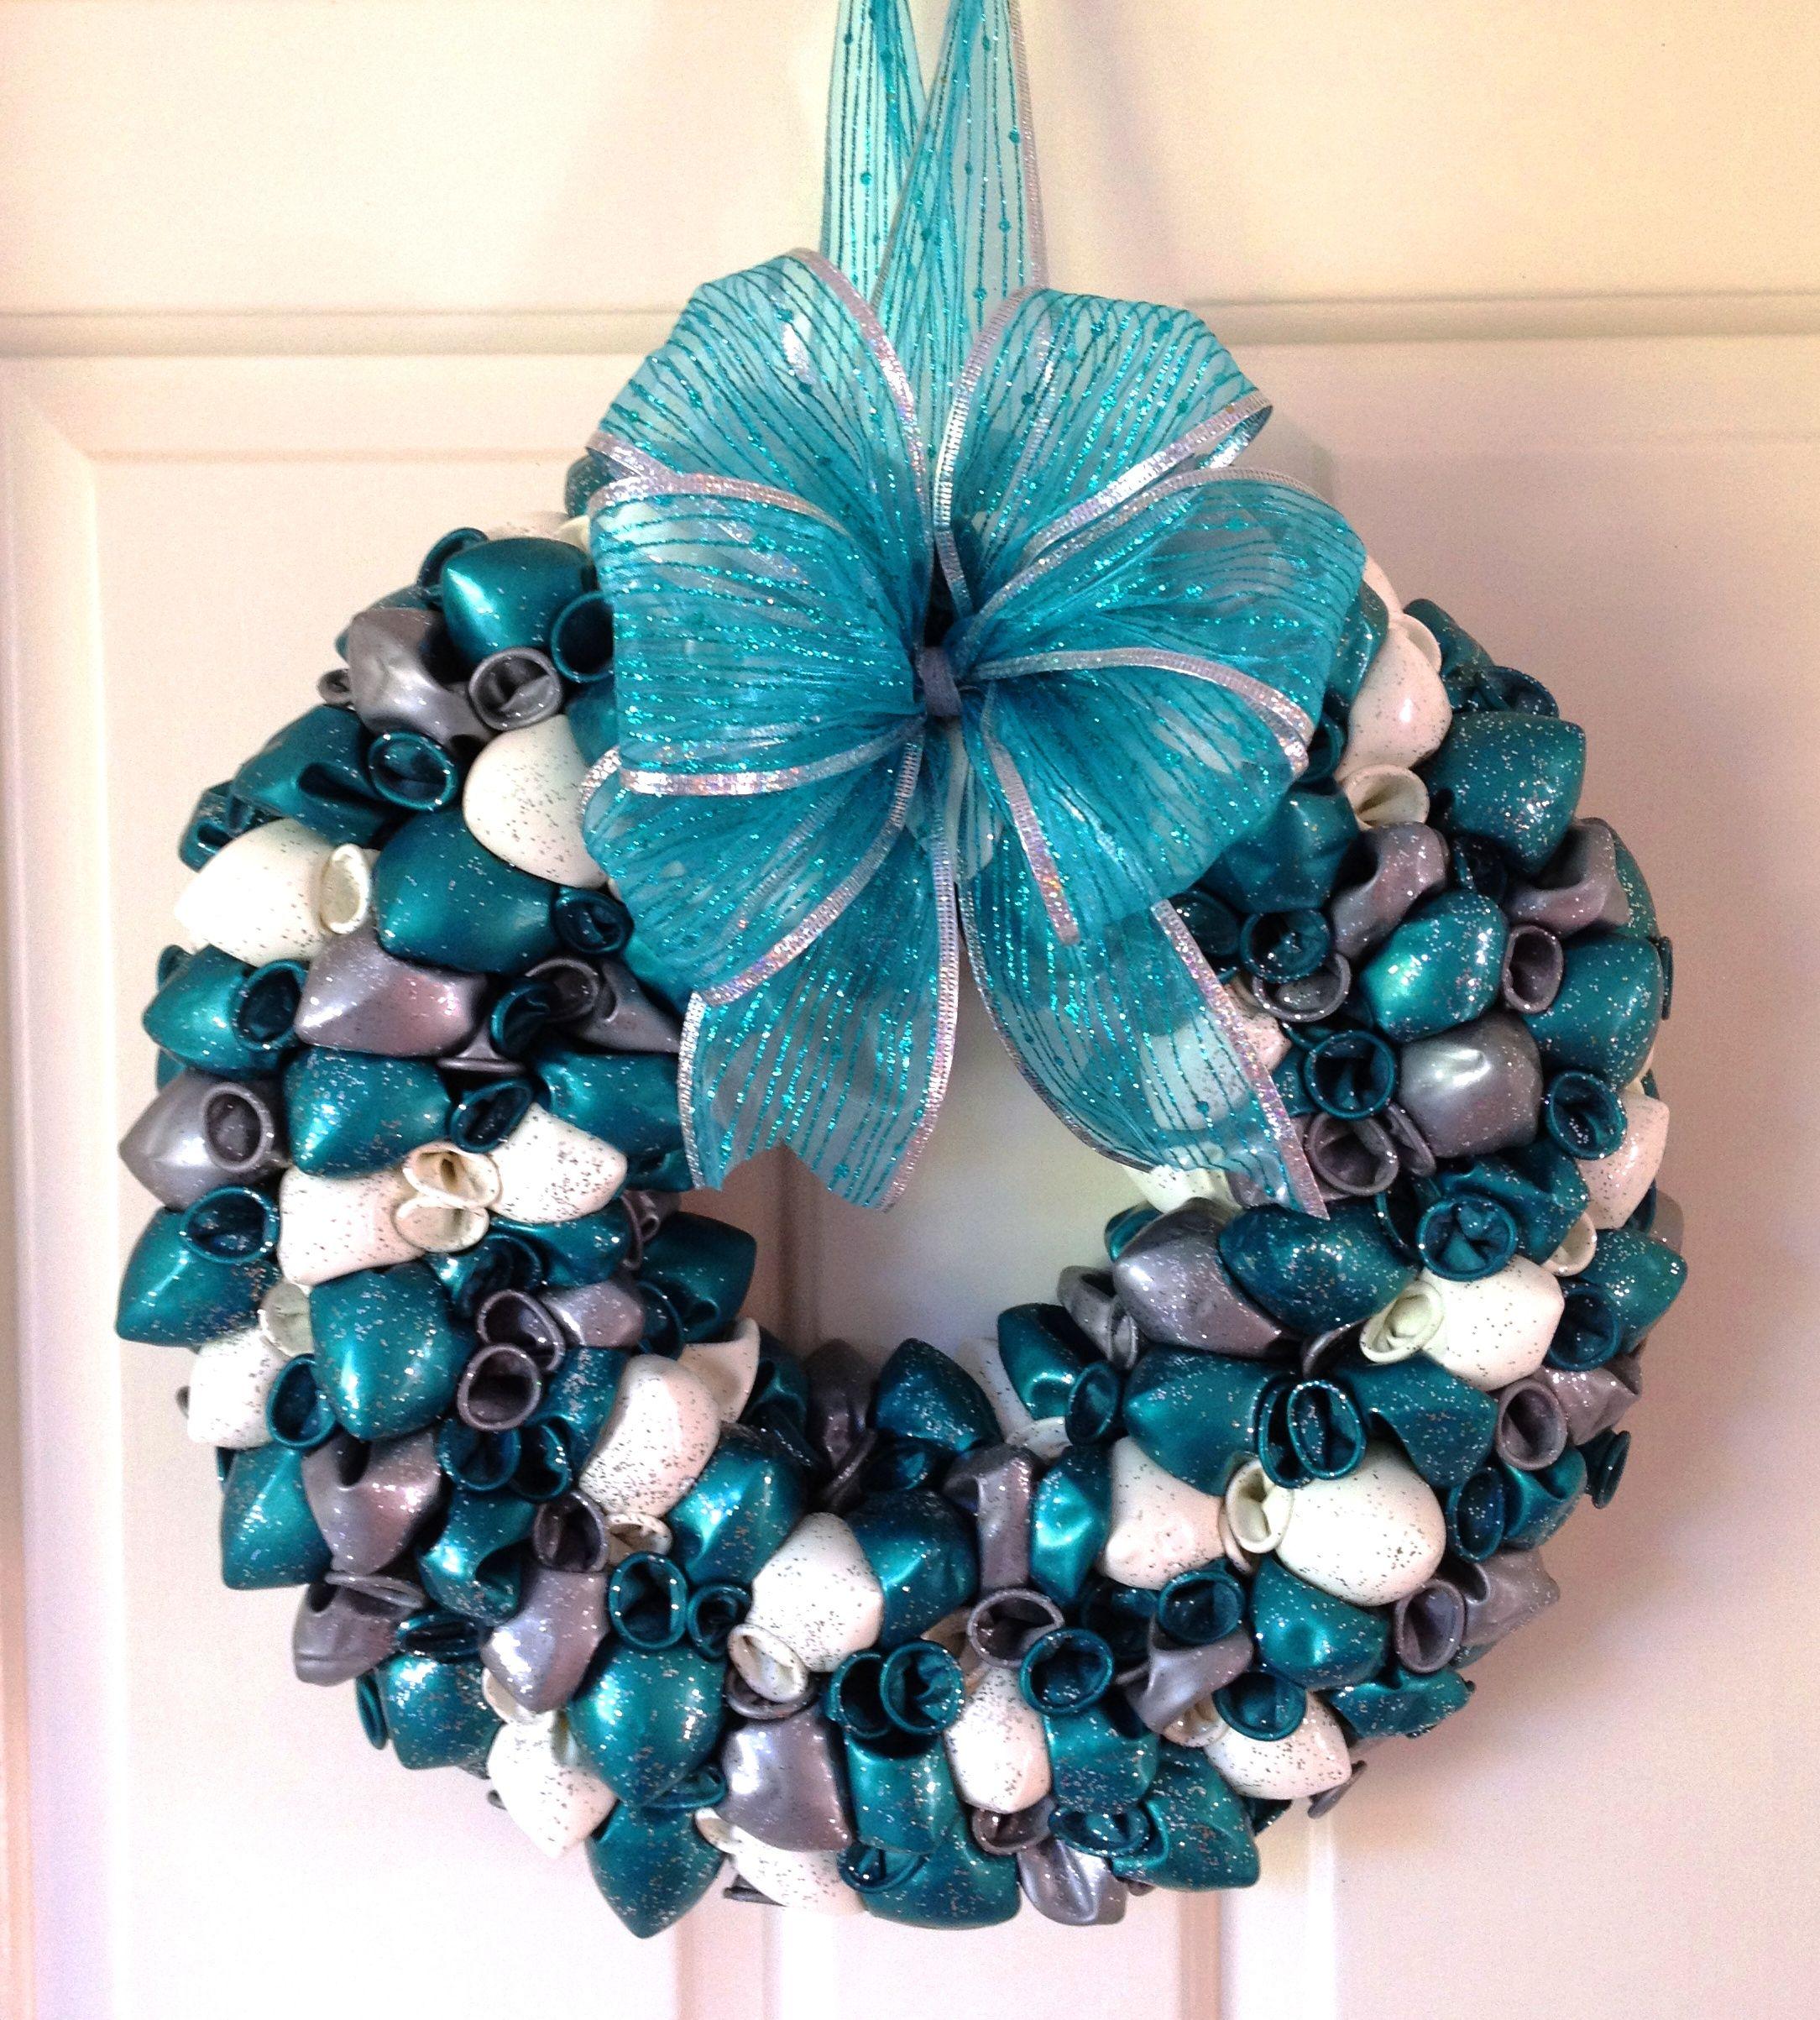 Christmas Balloon Wreath Teal Silver White Www Balloon Atics Co Uk Birthday Balloon Wreath Balloon Wreath Wreaths